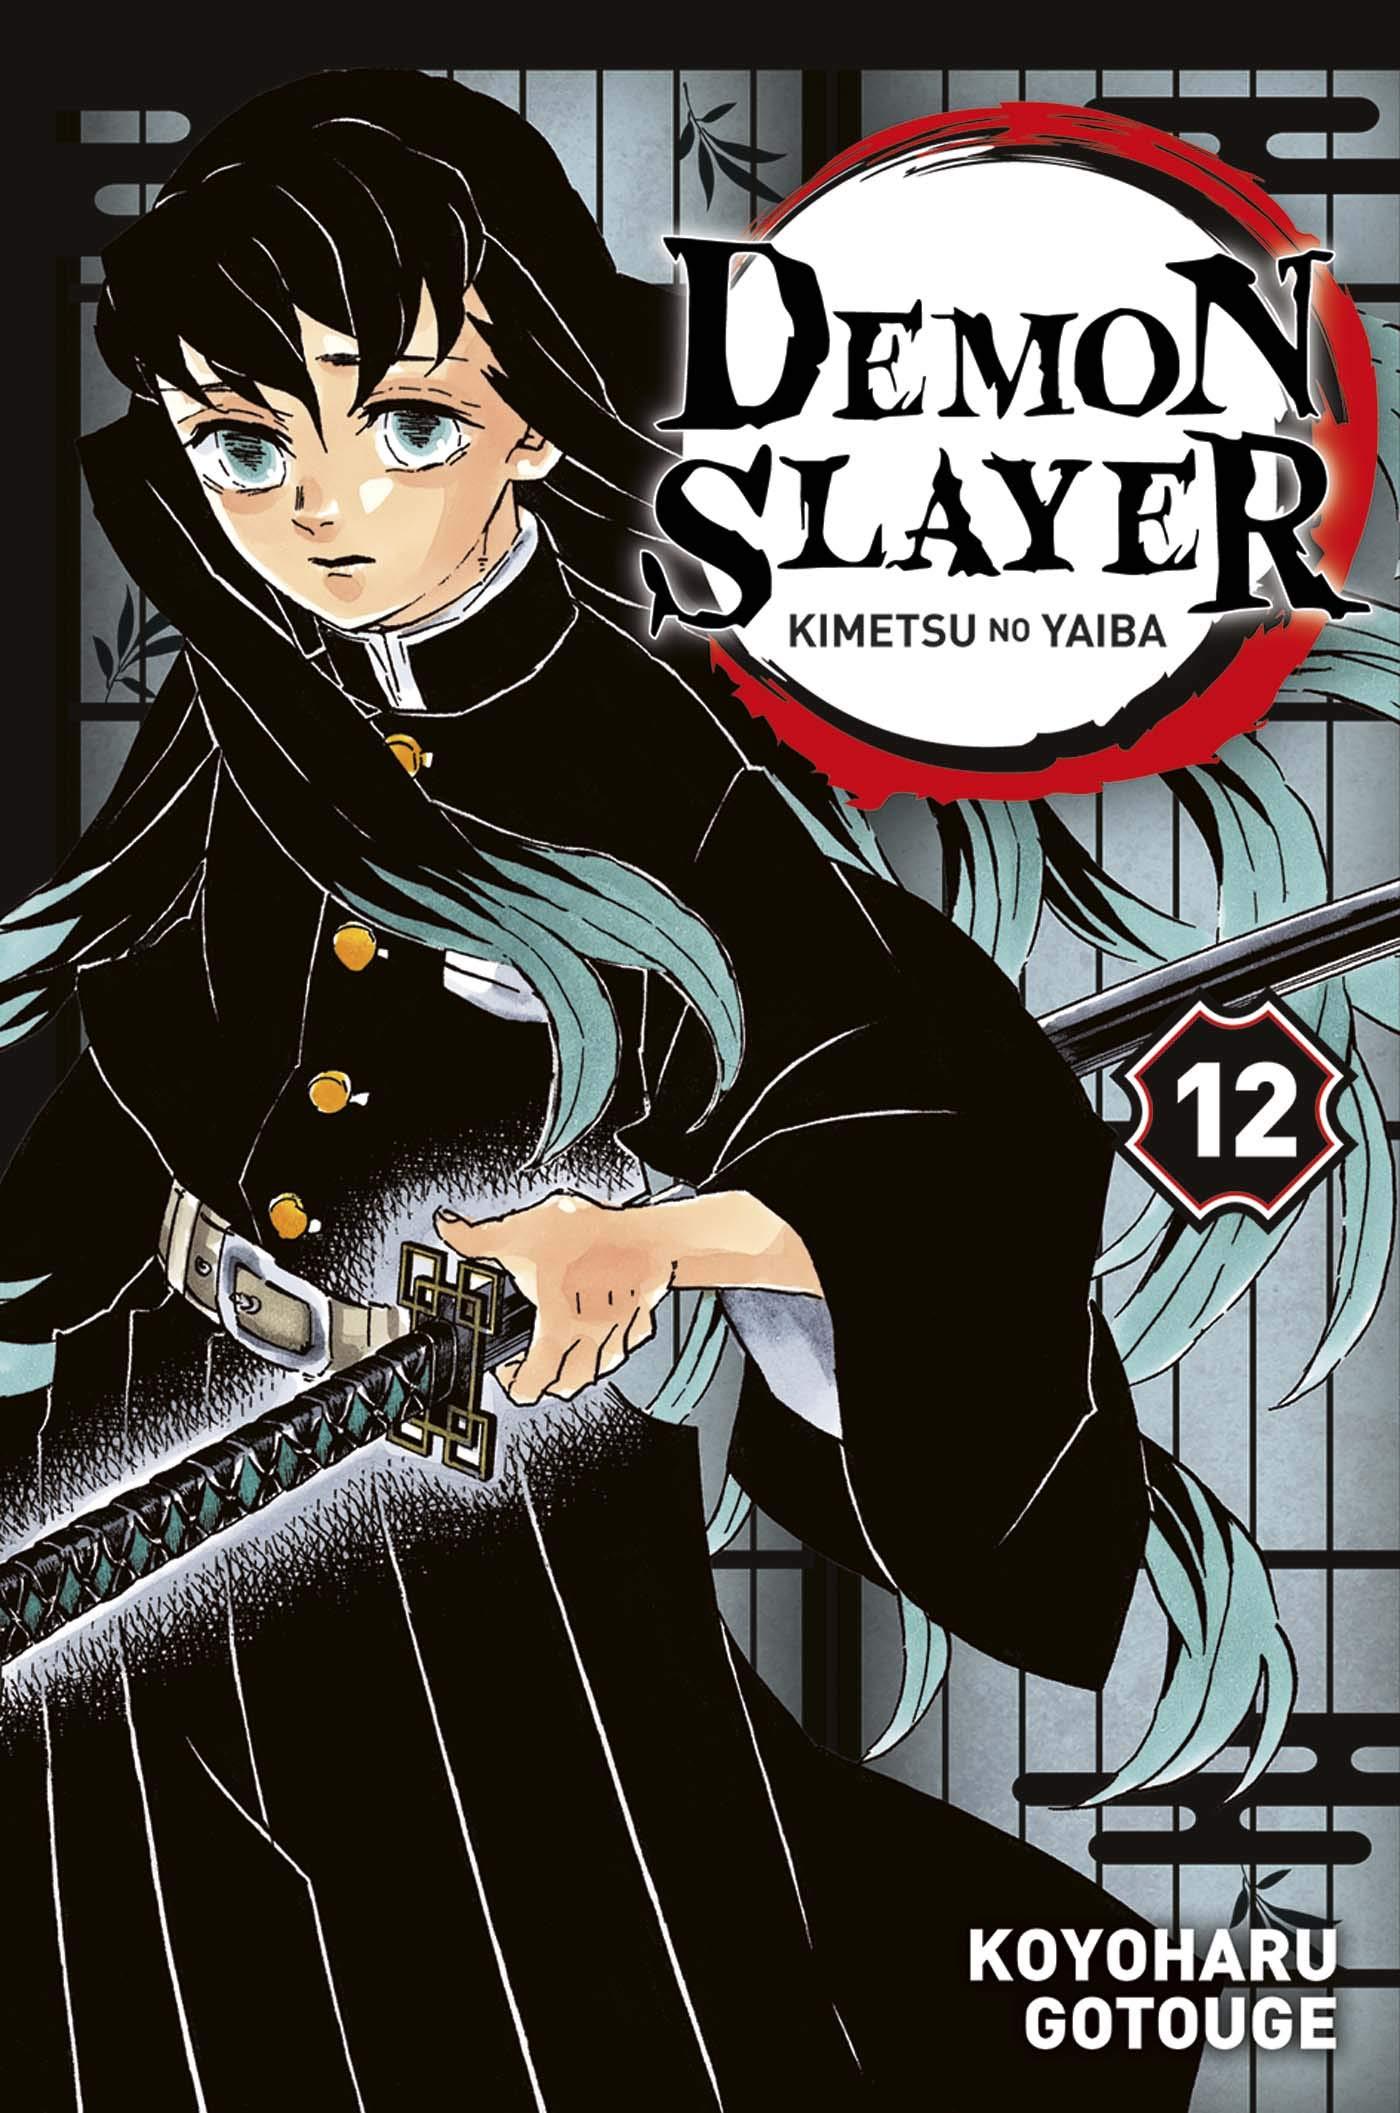 Demon slayer 12